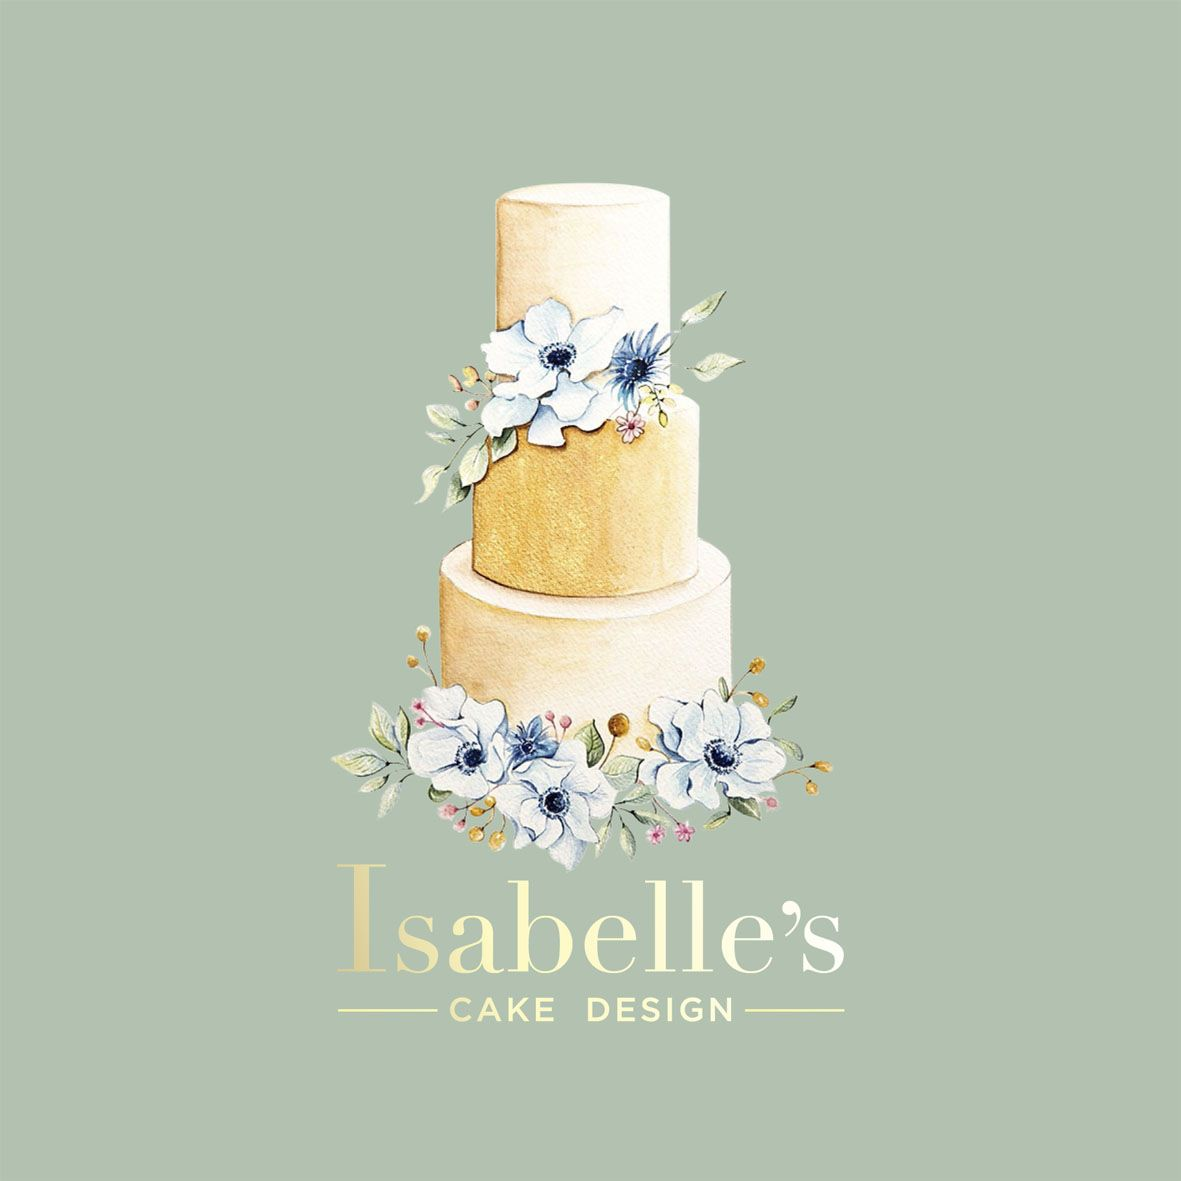 Logo design for Isabelle\'s cake design | logo de si gn | Pinterest ...